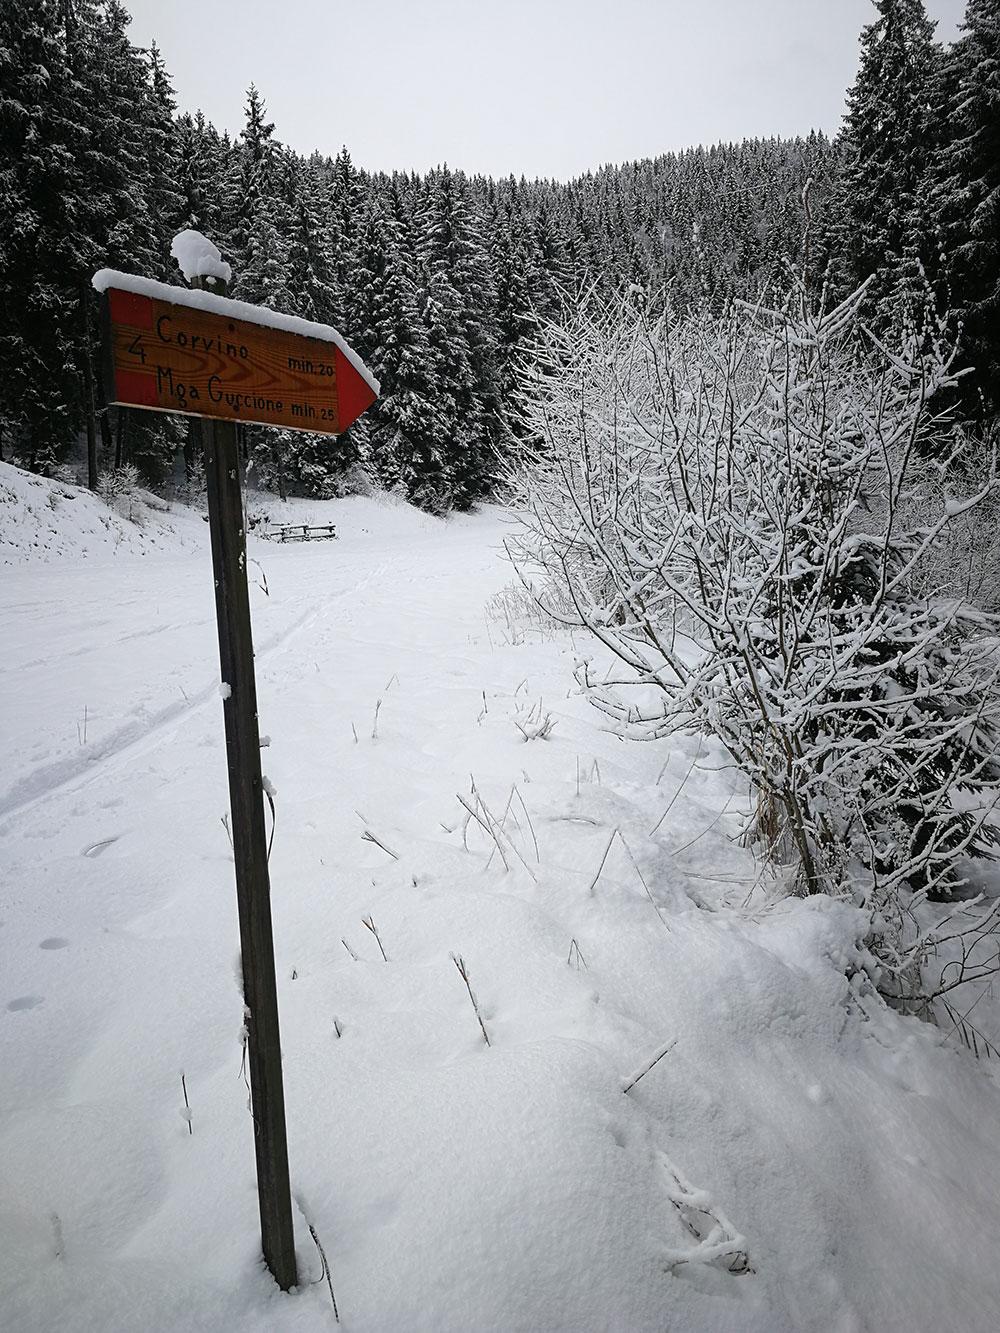 borno itinerario skialp